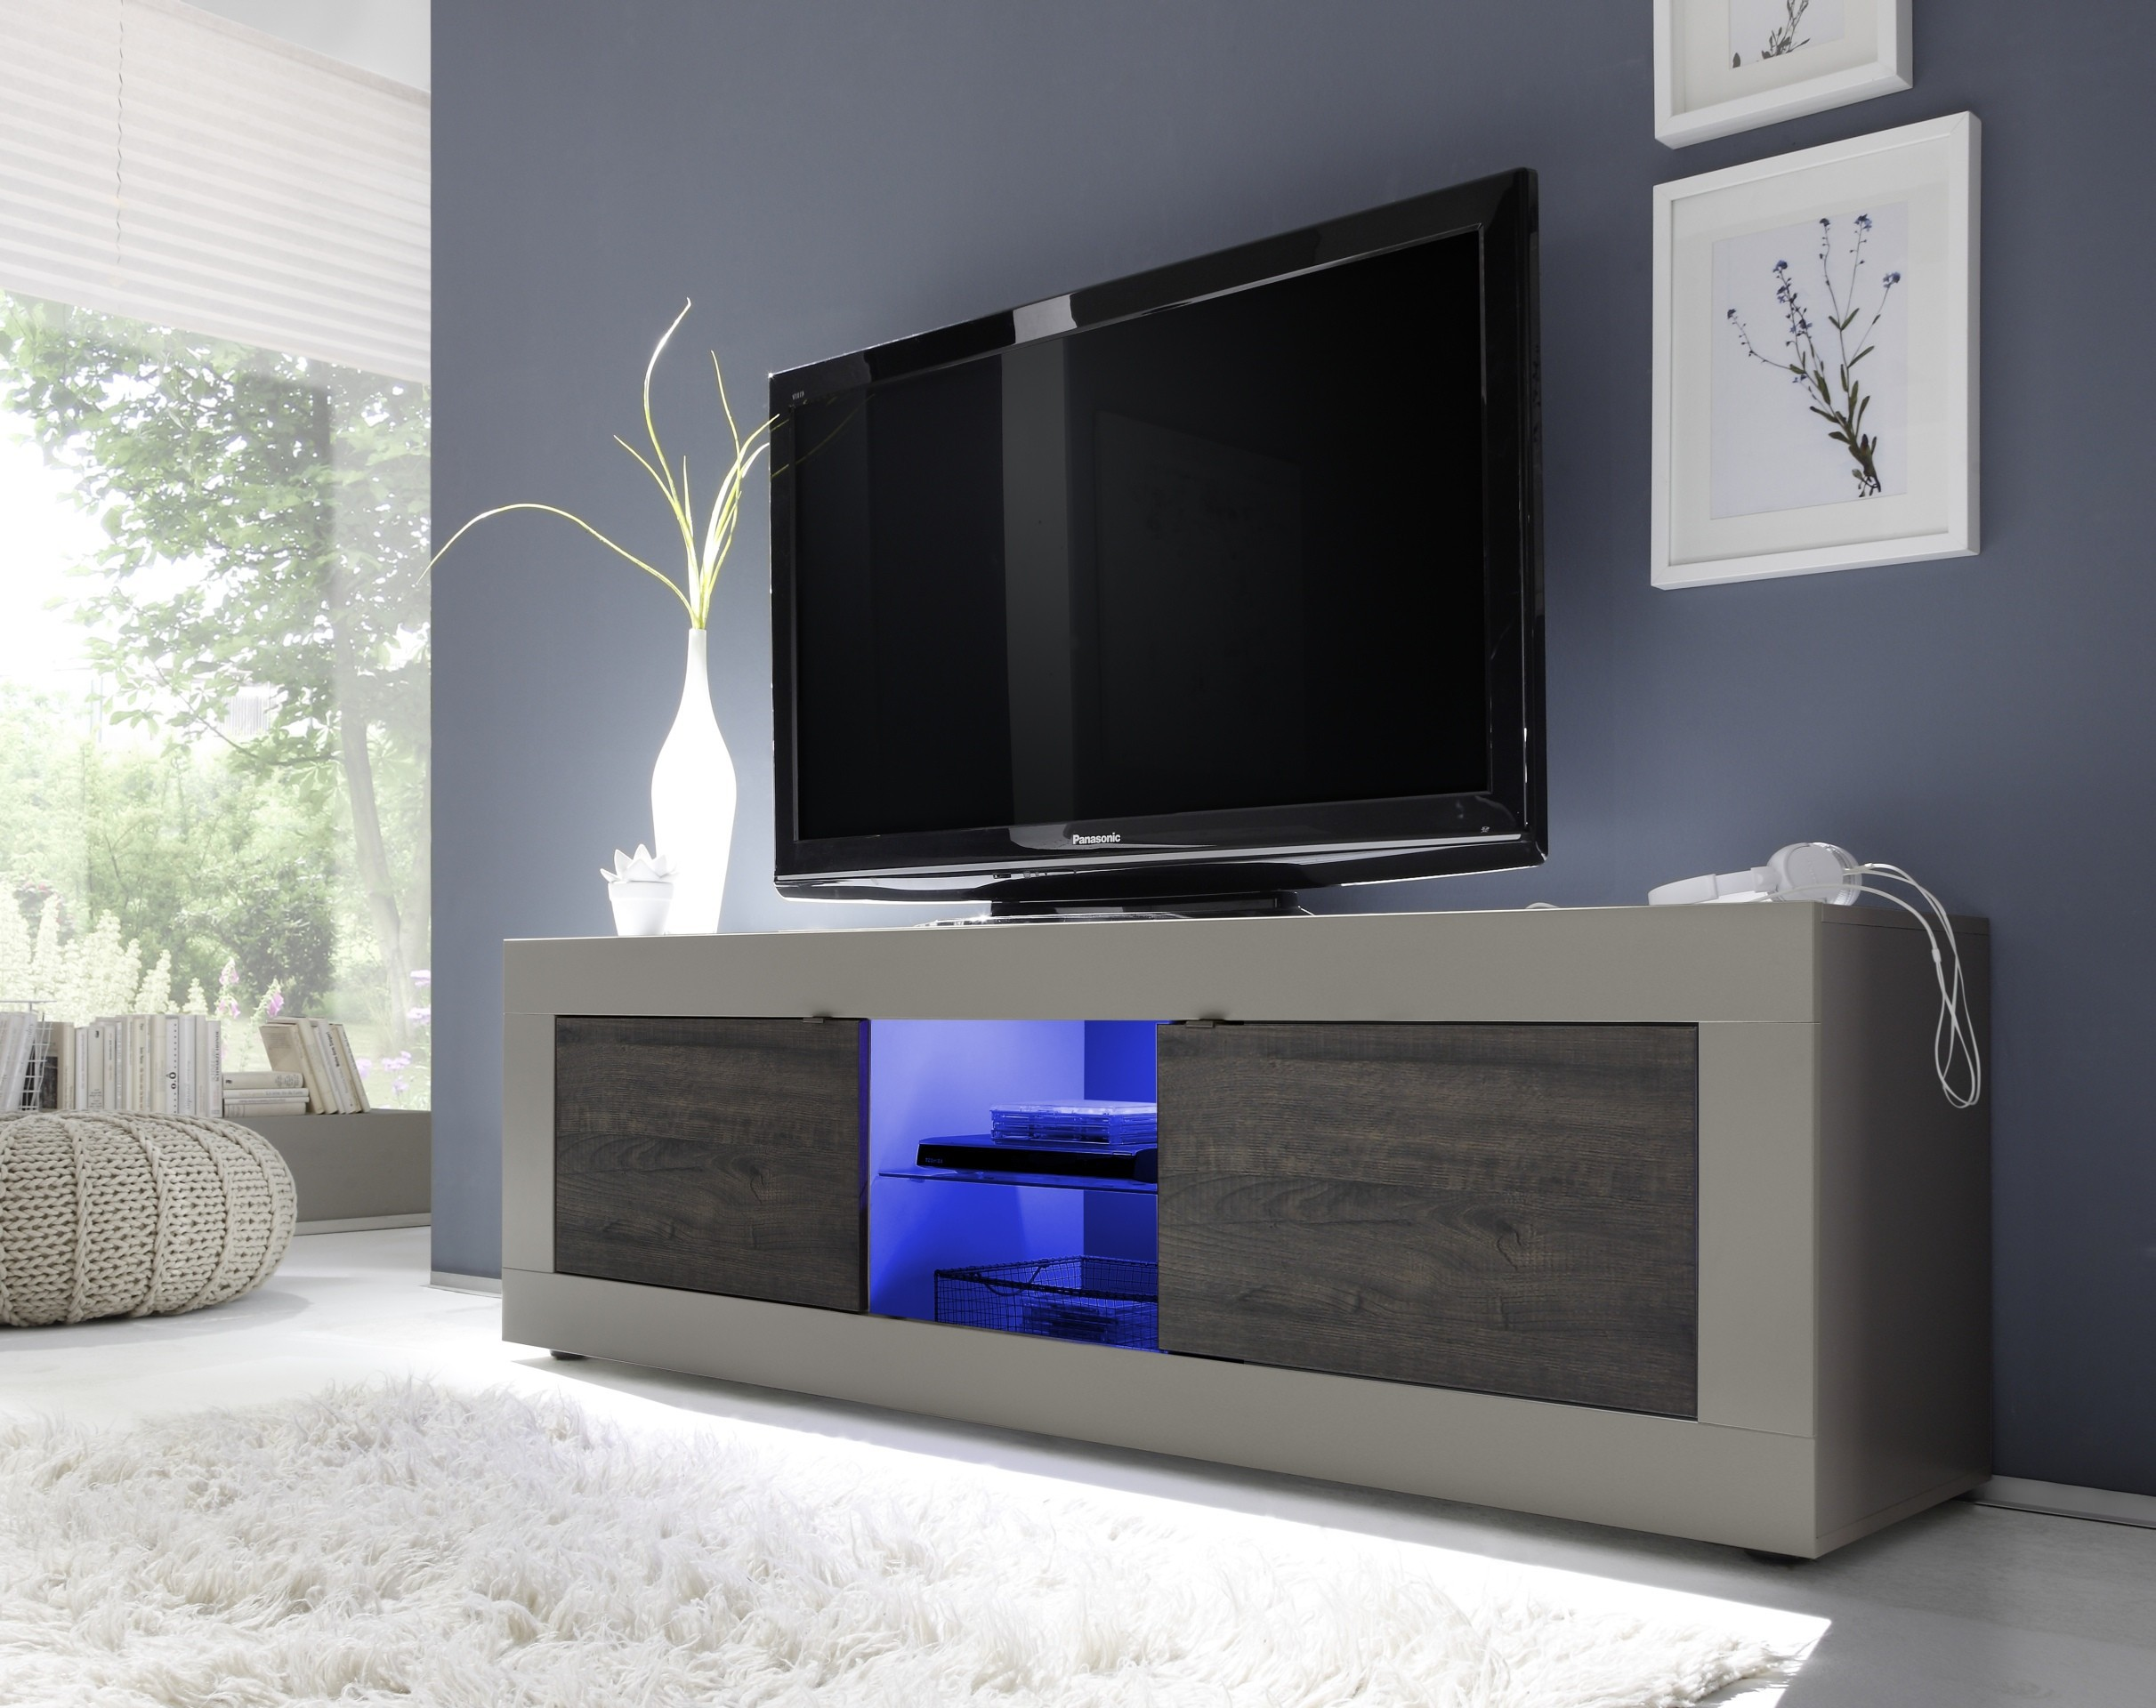 Meubles Tv Modernes Prix Discount Open Meubles # Meuble Tv Beige Blanc